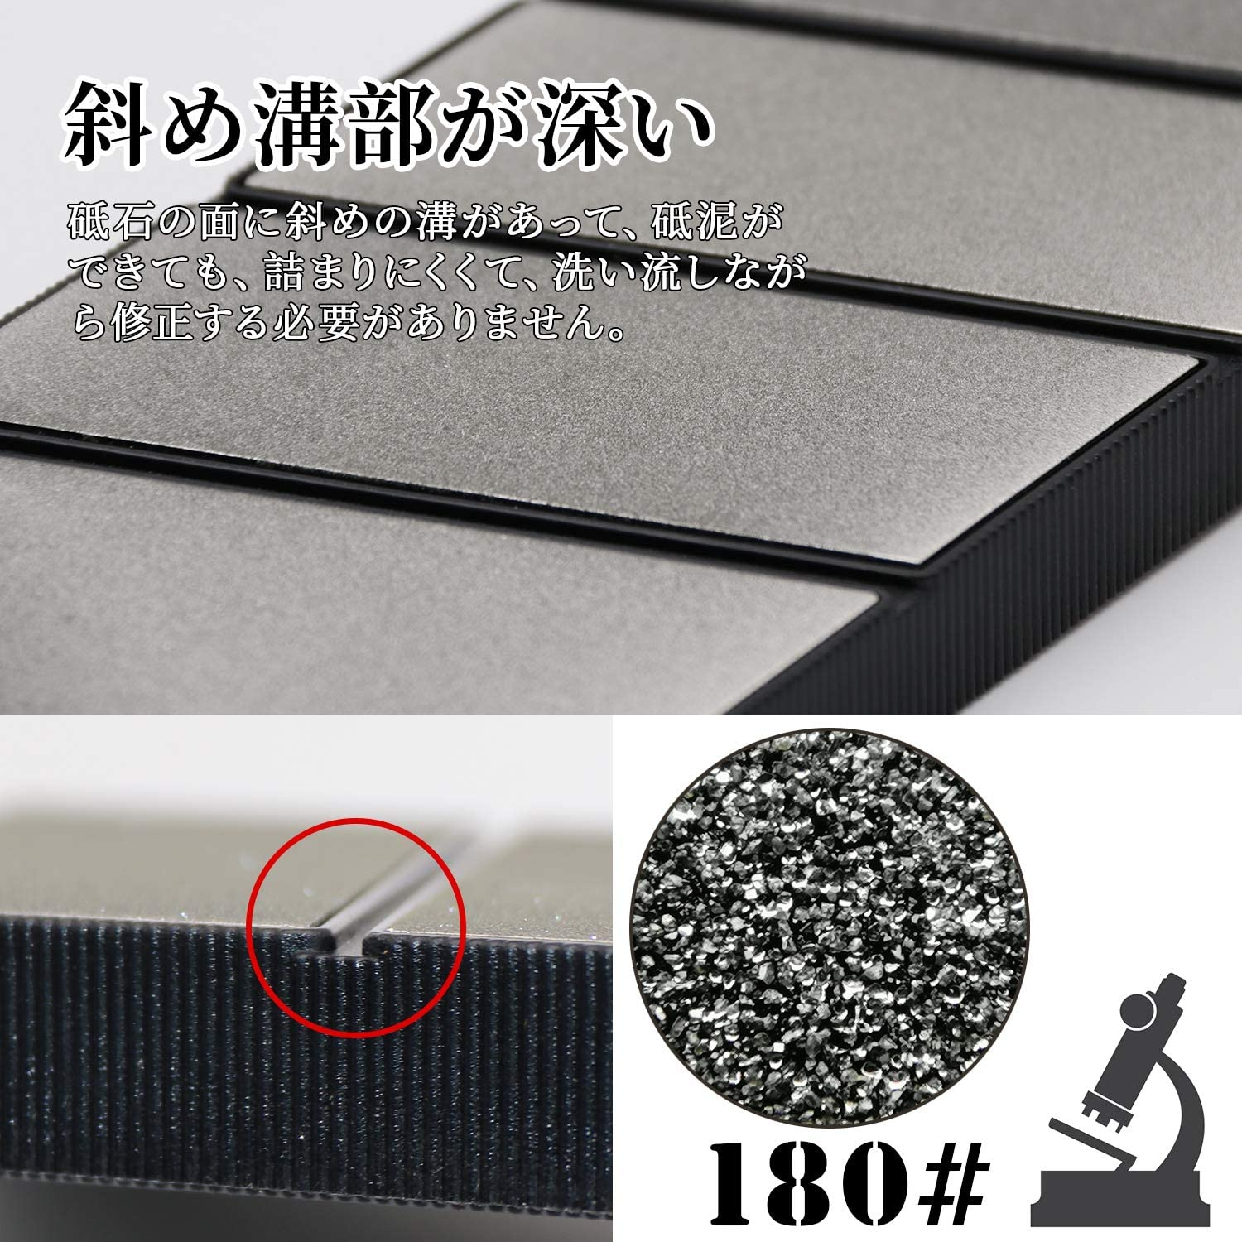 GOKEI 面直し用砥石 単面タイプ #180 258×82×18mmの商品画像4